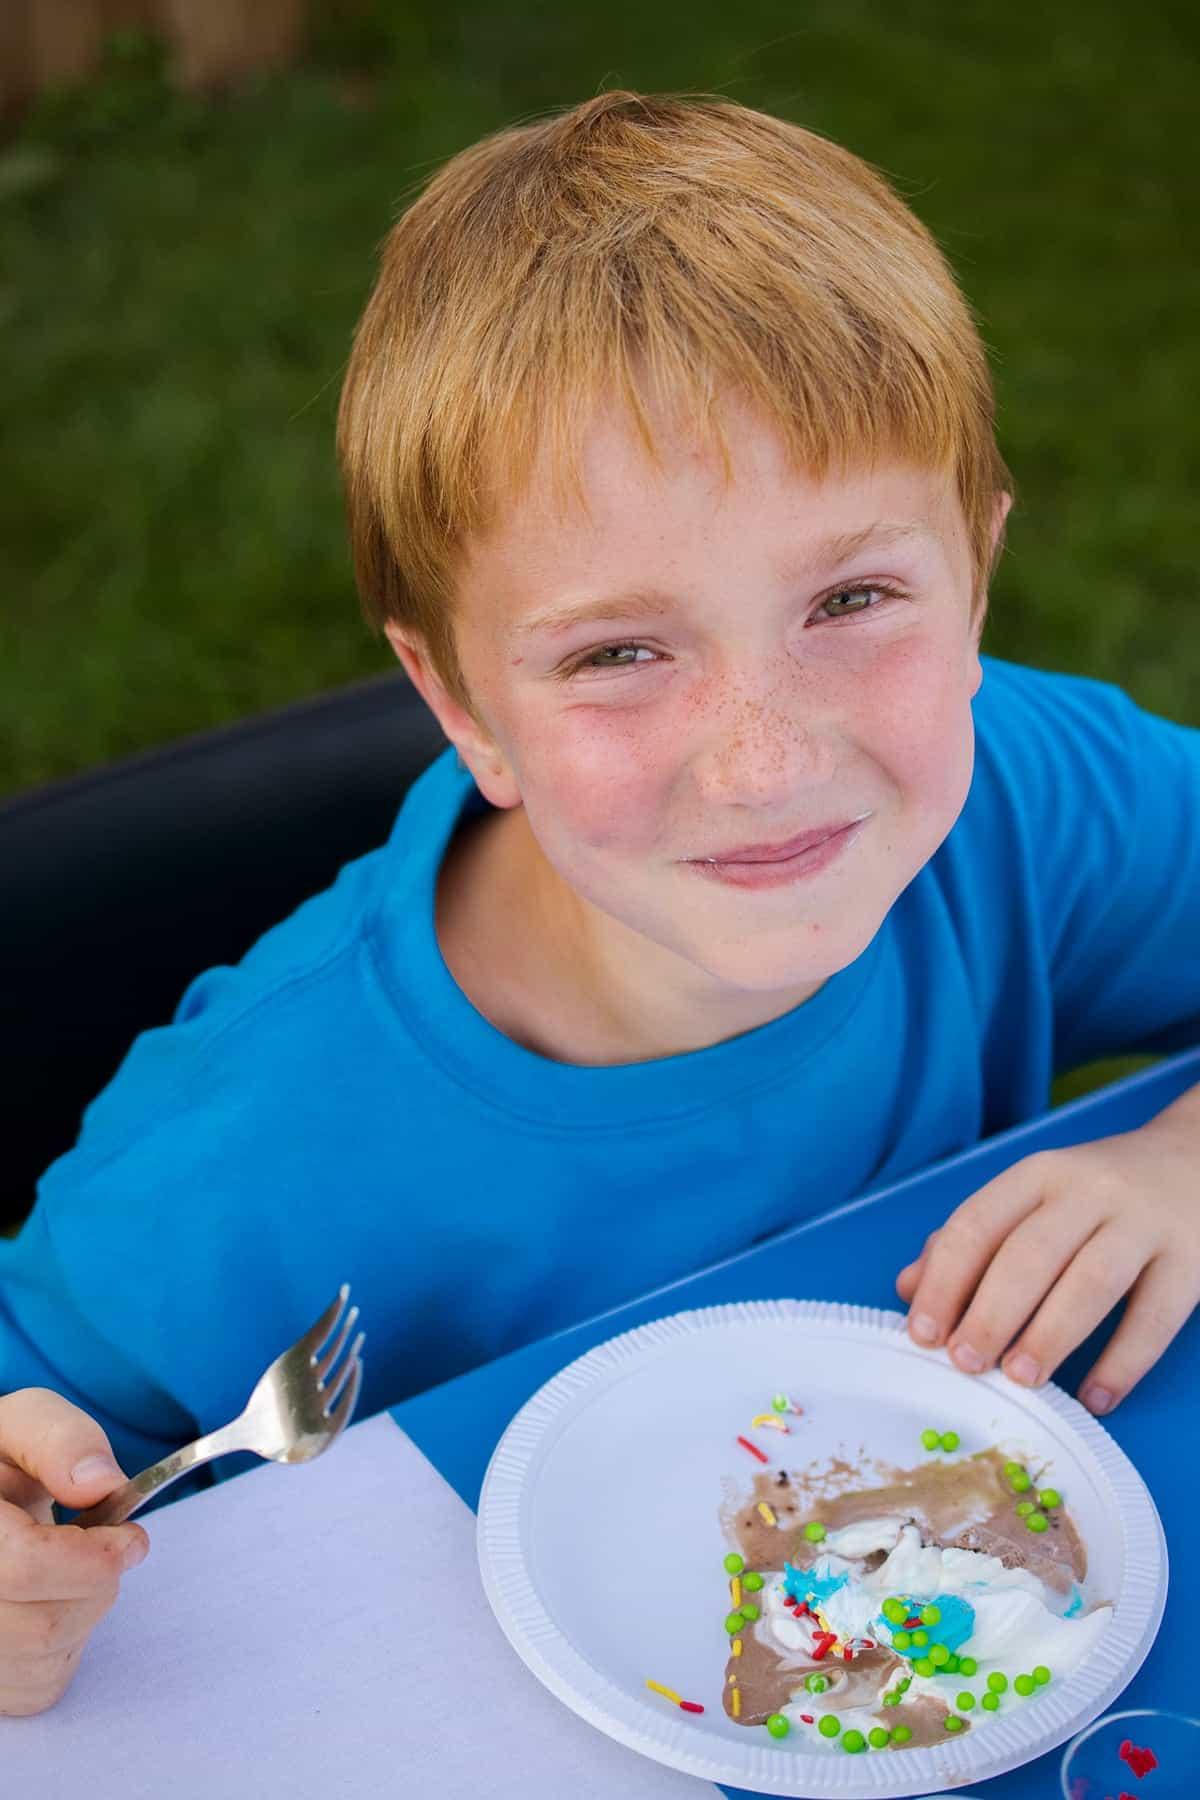 Boy in blue shirt enjoying ice cream cake